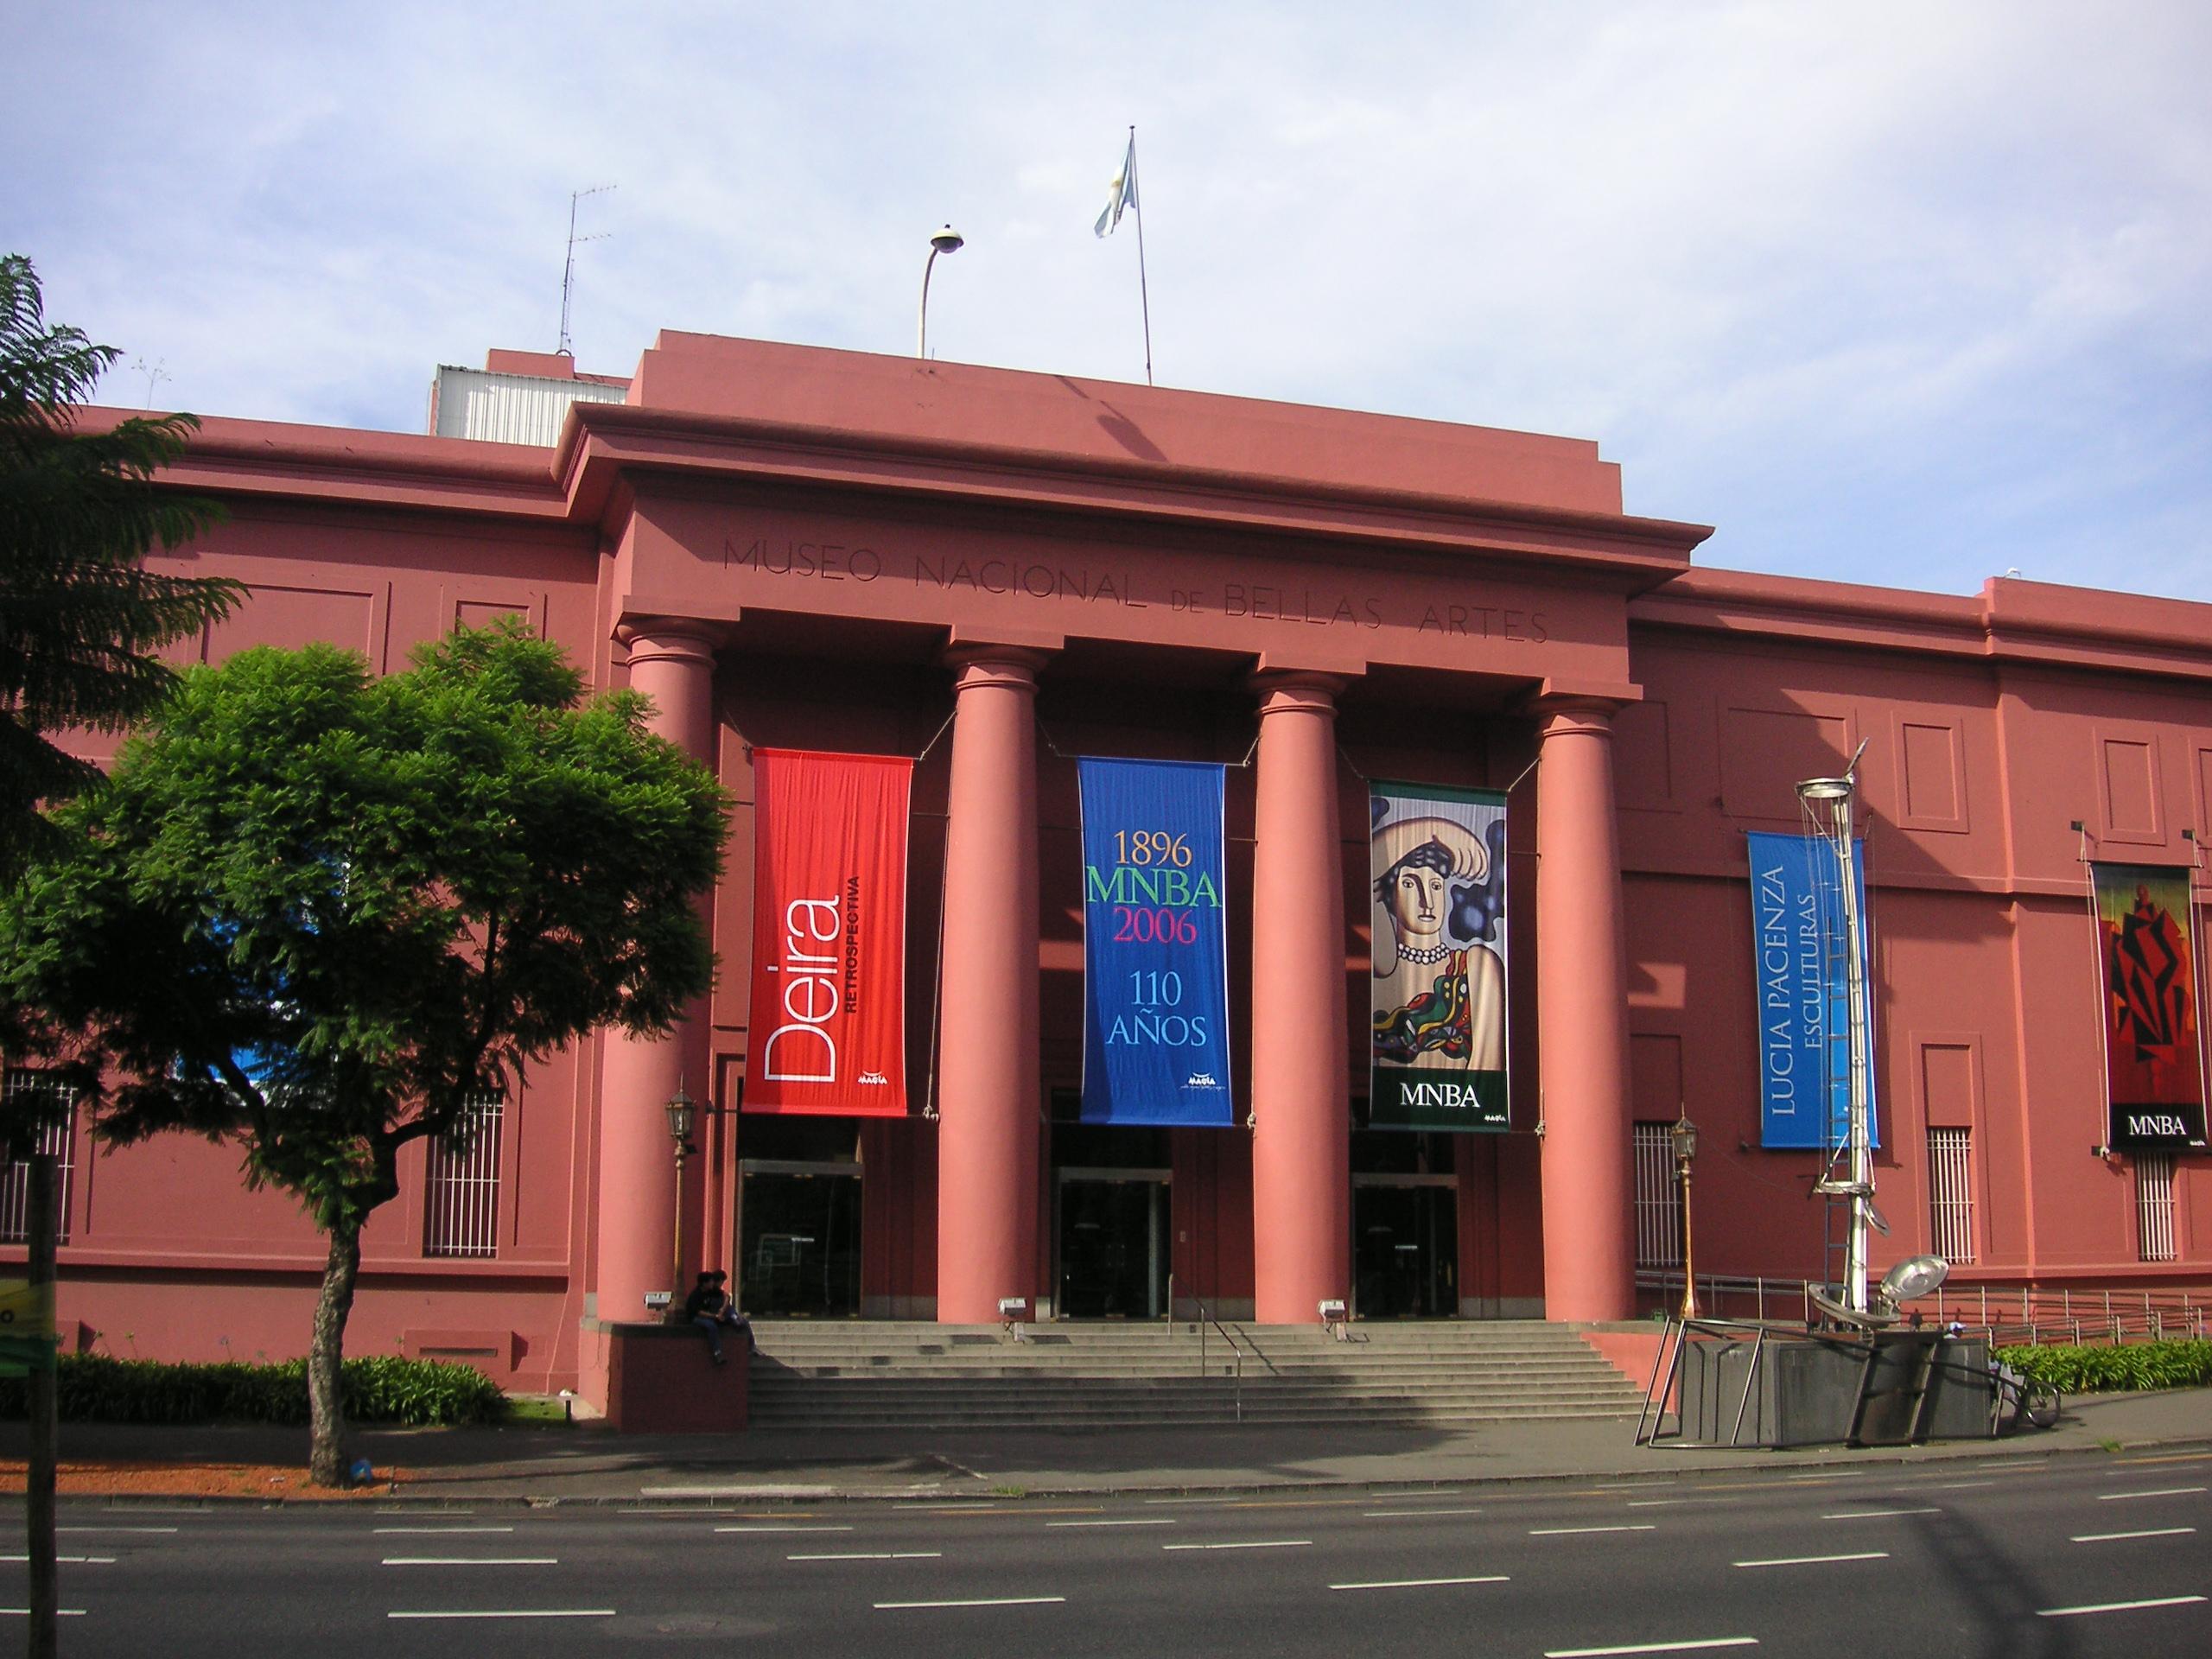 File:Museo Nacional de Bellas Artes (12407).jpg - Wikimedia Commons